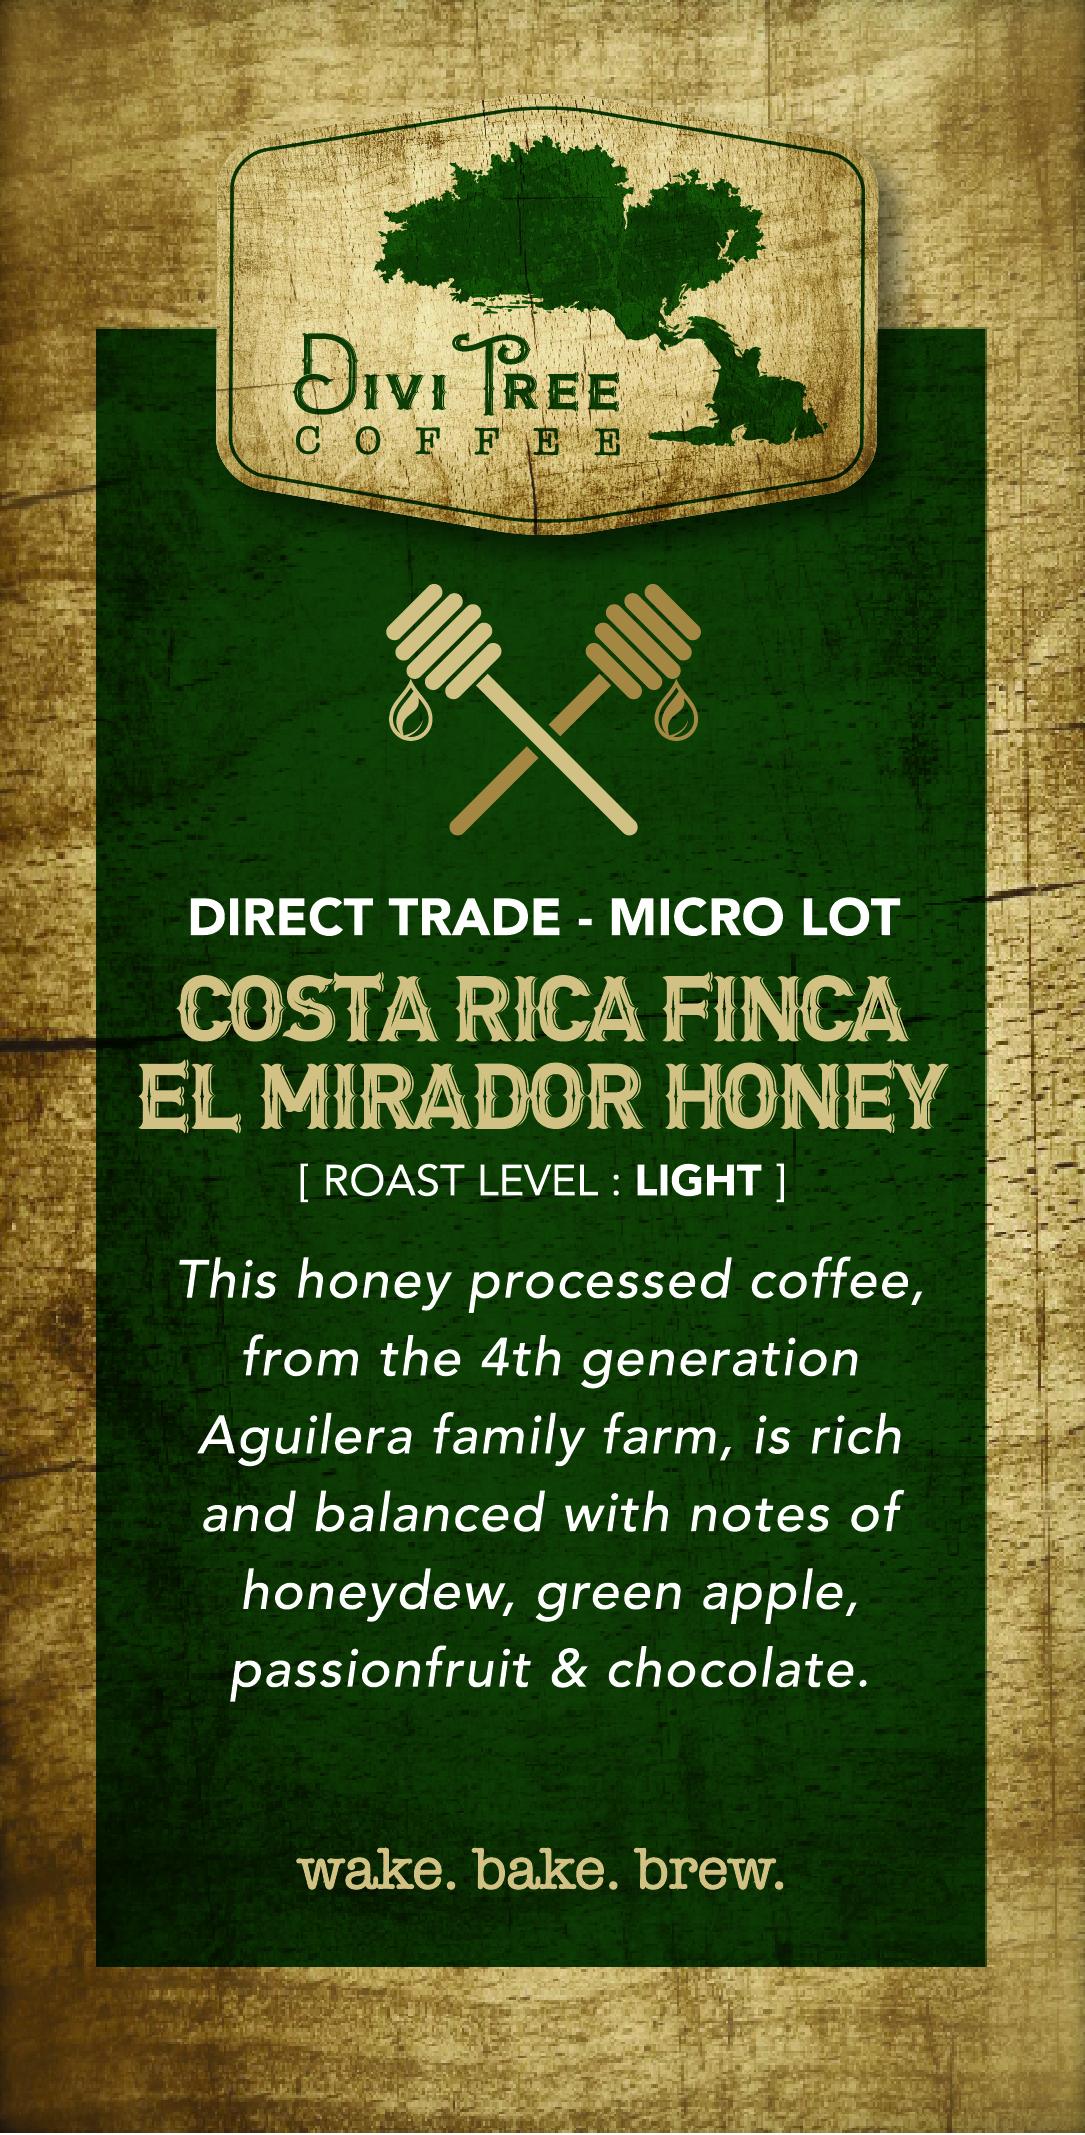 Costa Rica Finca - El Mirador Honey